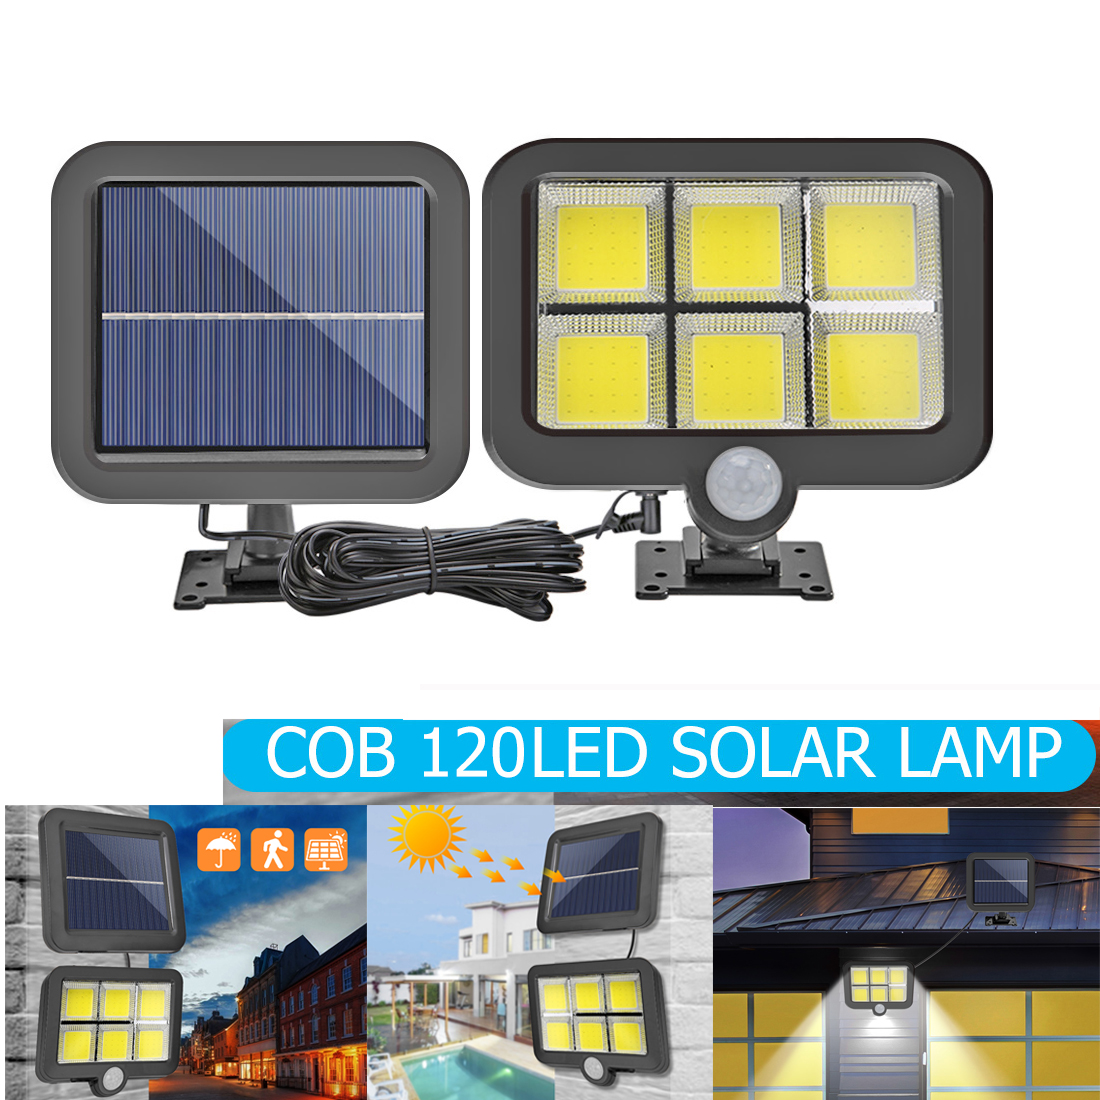 56/100/120LED COB Solar Light Outdoor Lighting PIR Motion Sensor Waterproof Street Light Powered Path Solar Lamp